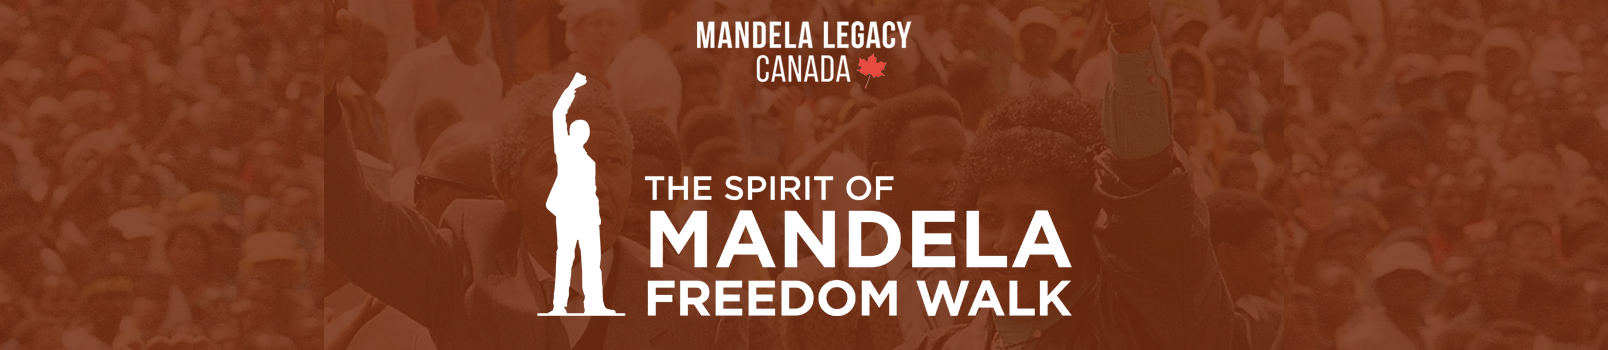 MandelaCanada-Slider-Walk